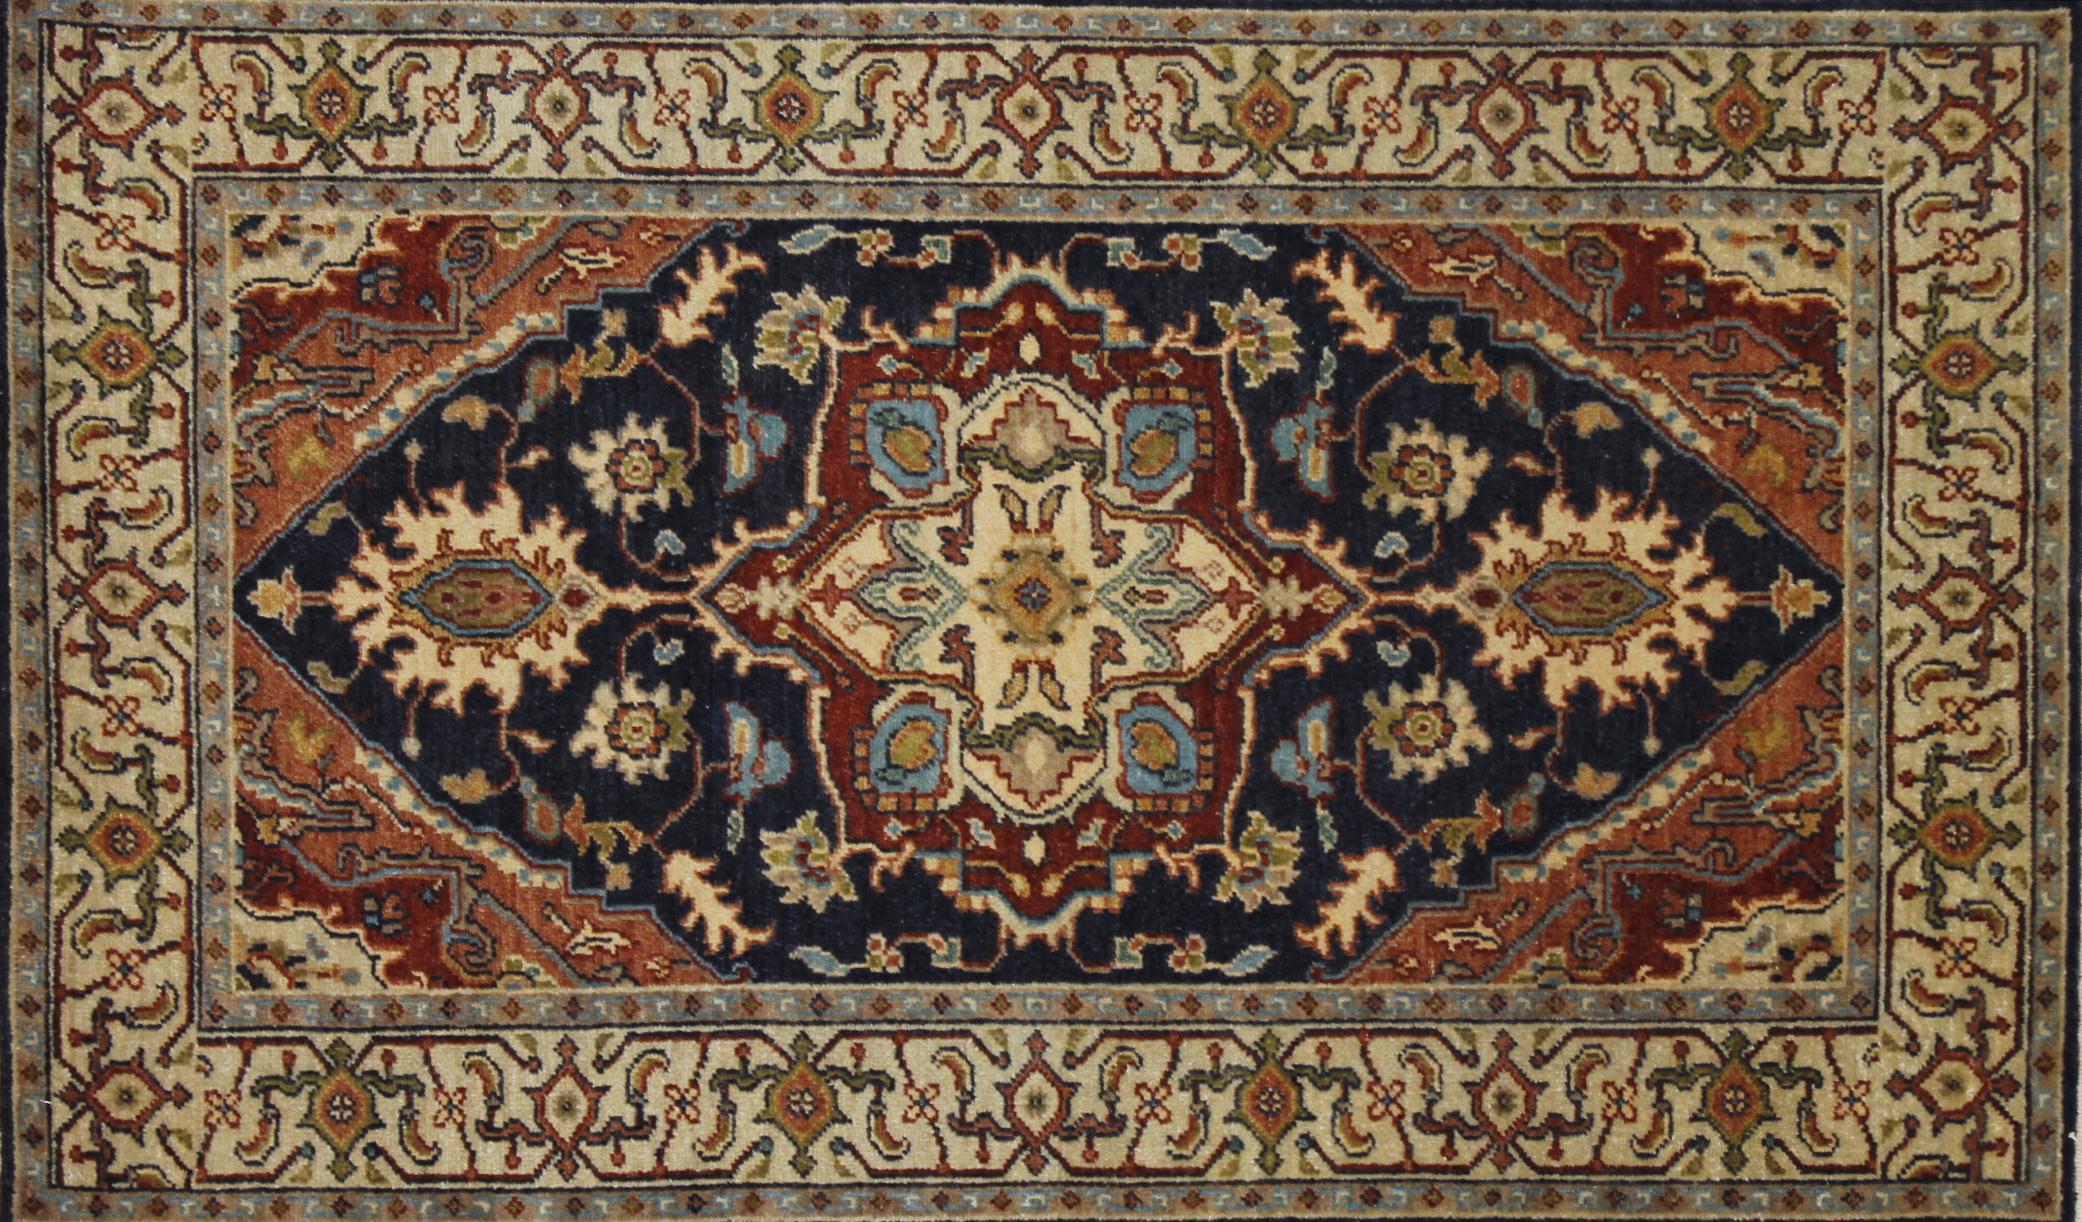 3x5 Heriz/Serapi Hand Knotted Wool Area Rug - MR022673